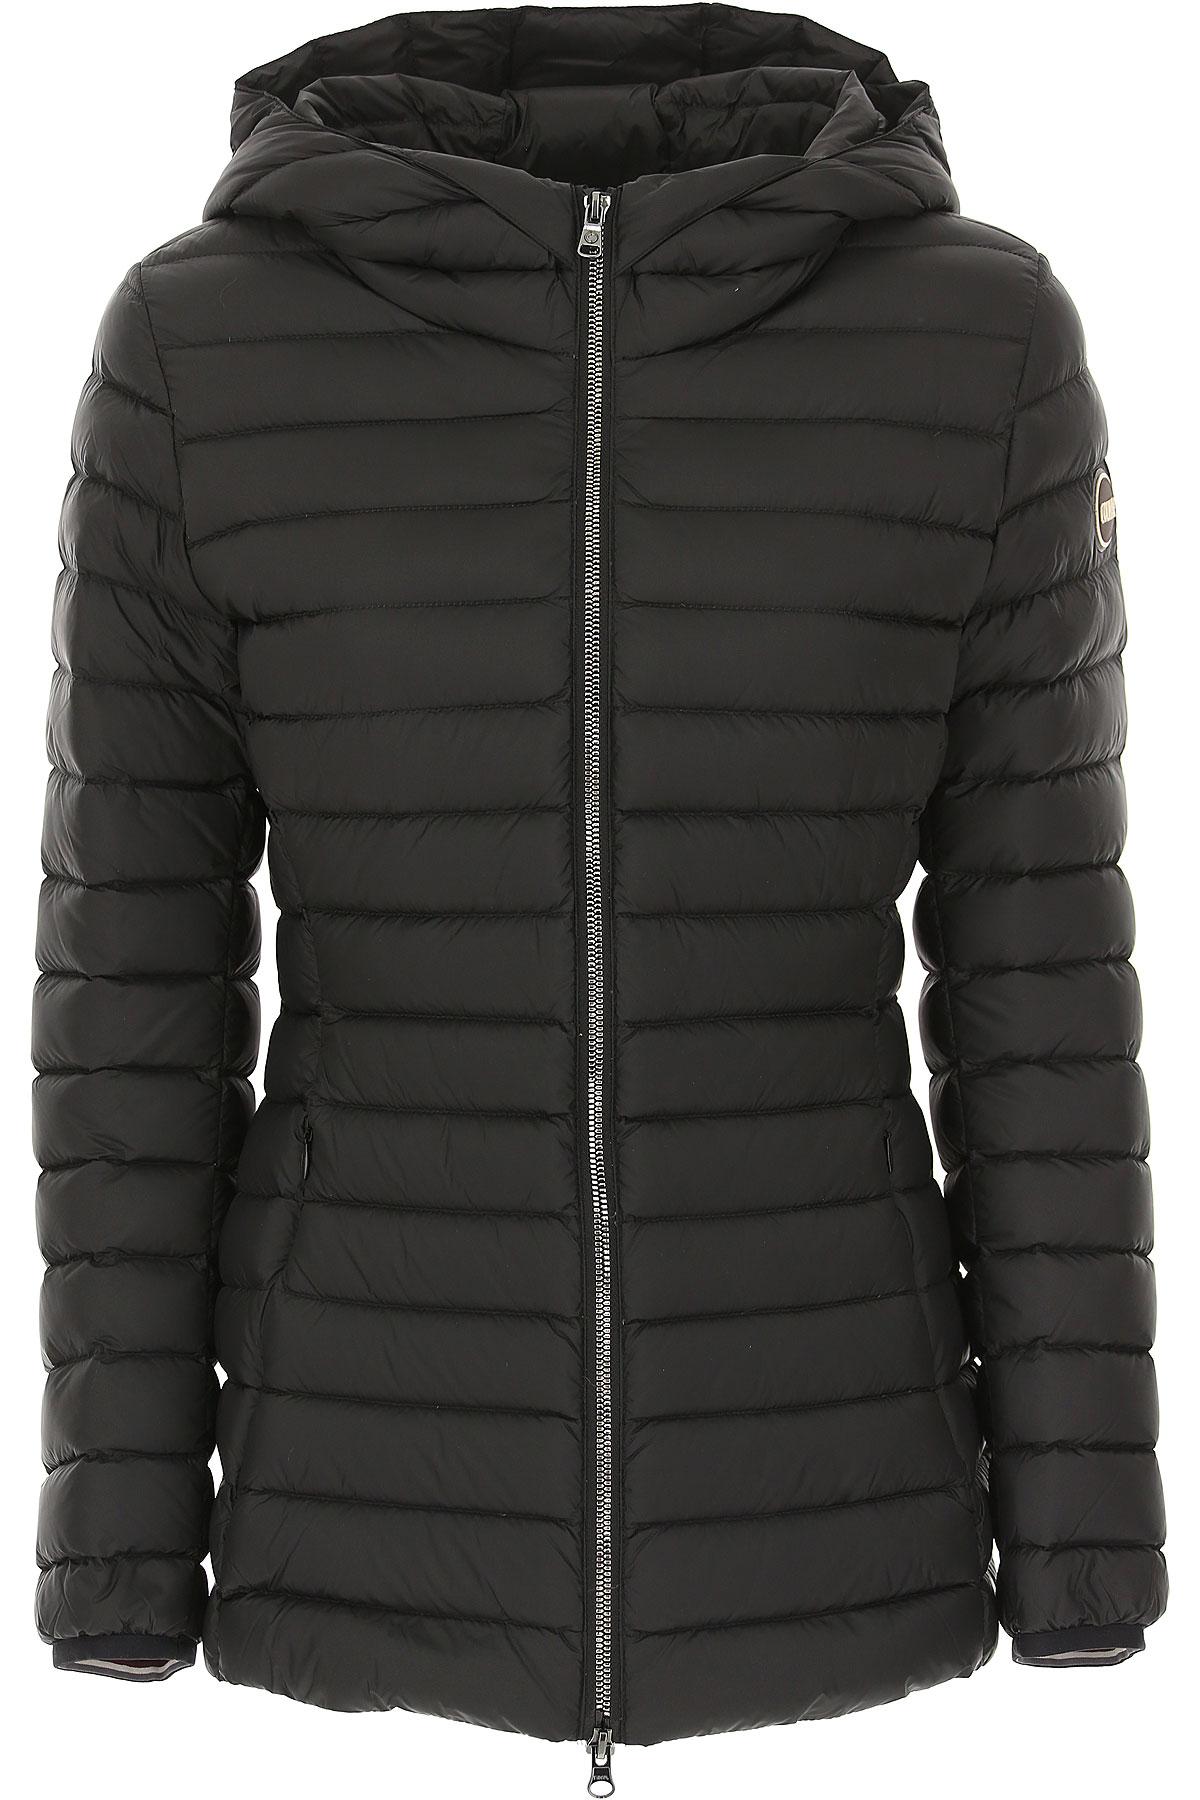 Image of Colmar Down Jacket for Women, Puffer Ski Jacket, Black, Down, 2017, 10 12 2 4 6 8